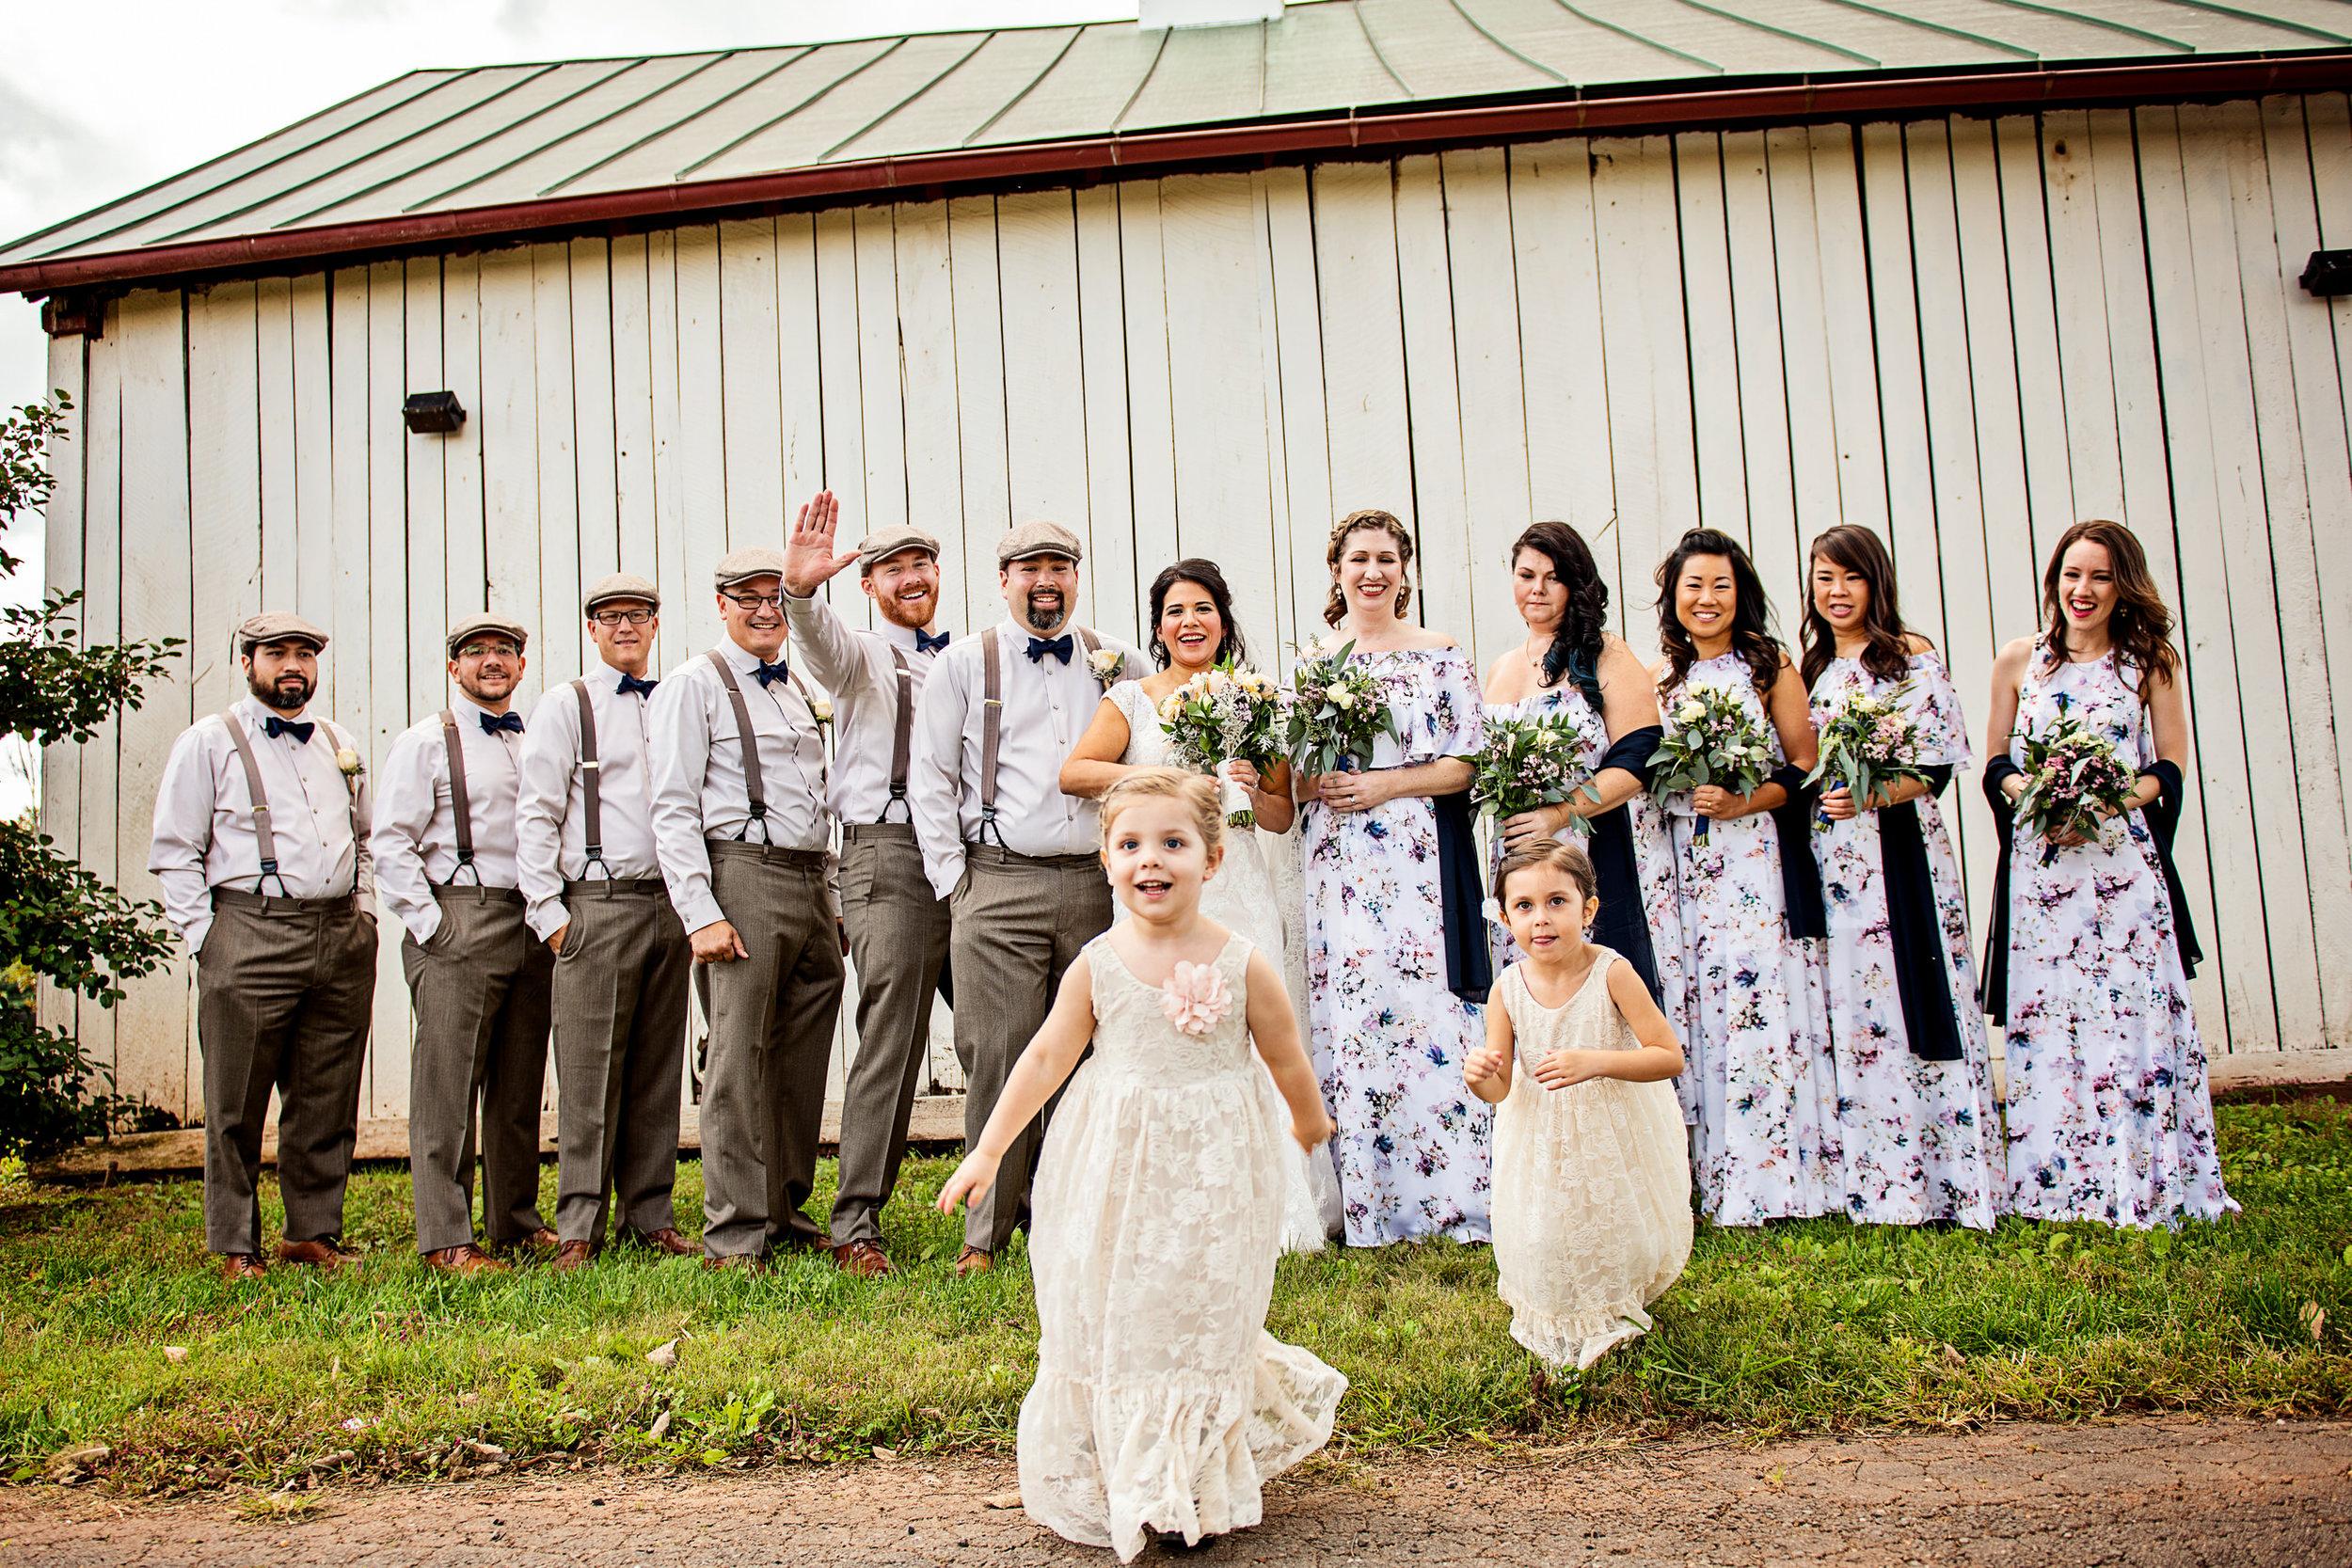 FaithLikeAMustardSeedWedding-Jen&Jeff-WeddingParty-4.jpg